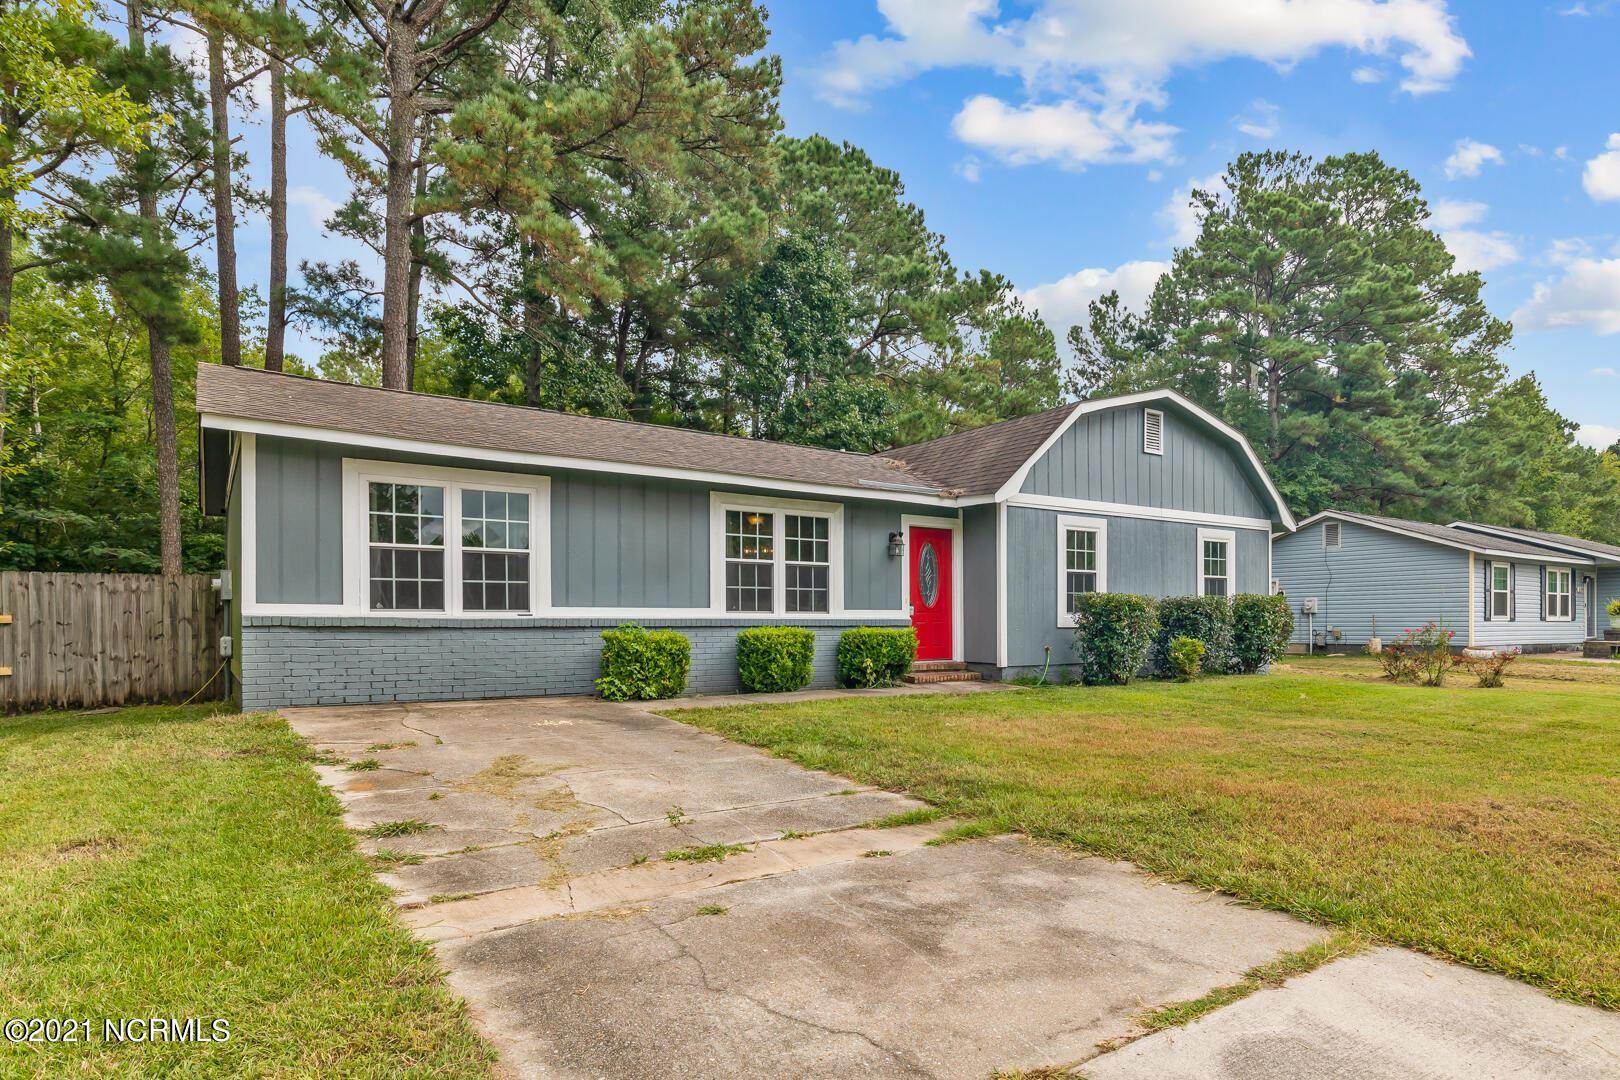 Photo of 516 Walnut Drive, Jacksonville, NC 28540 (MLS # 100291301)